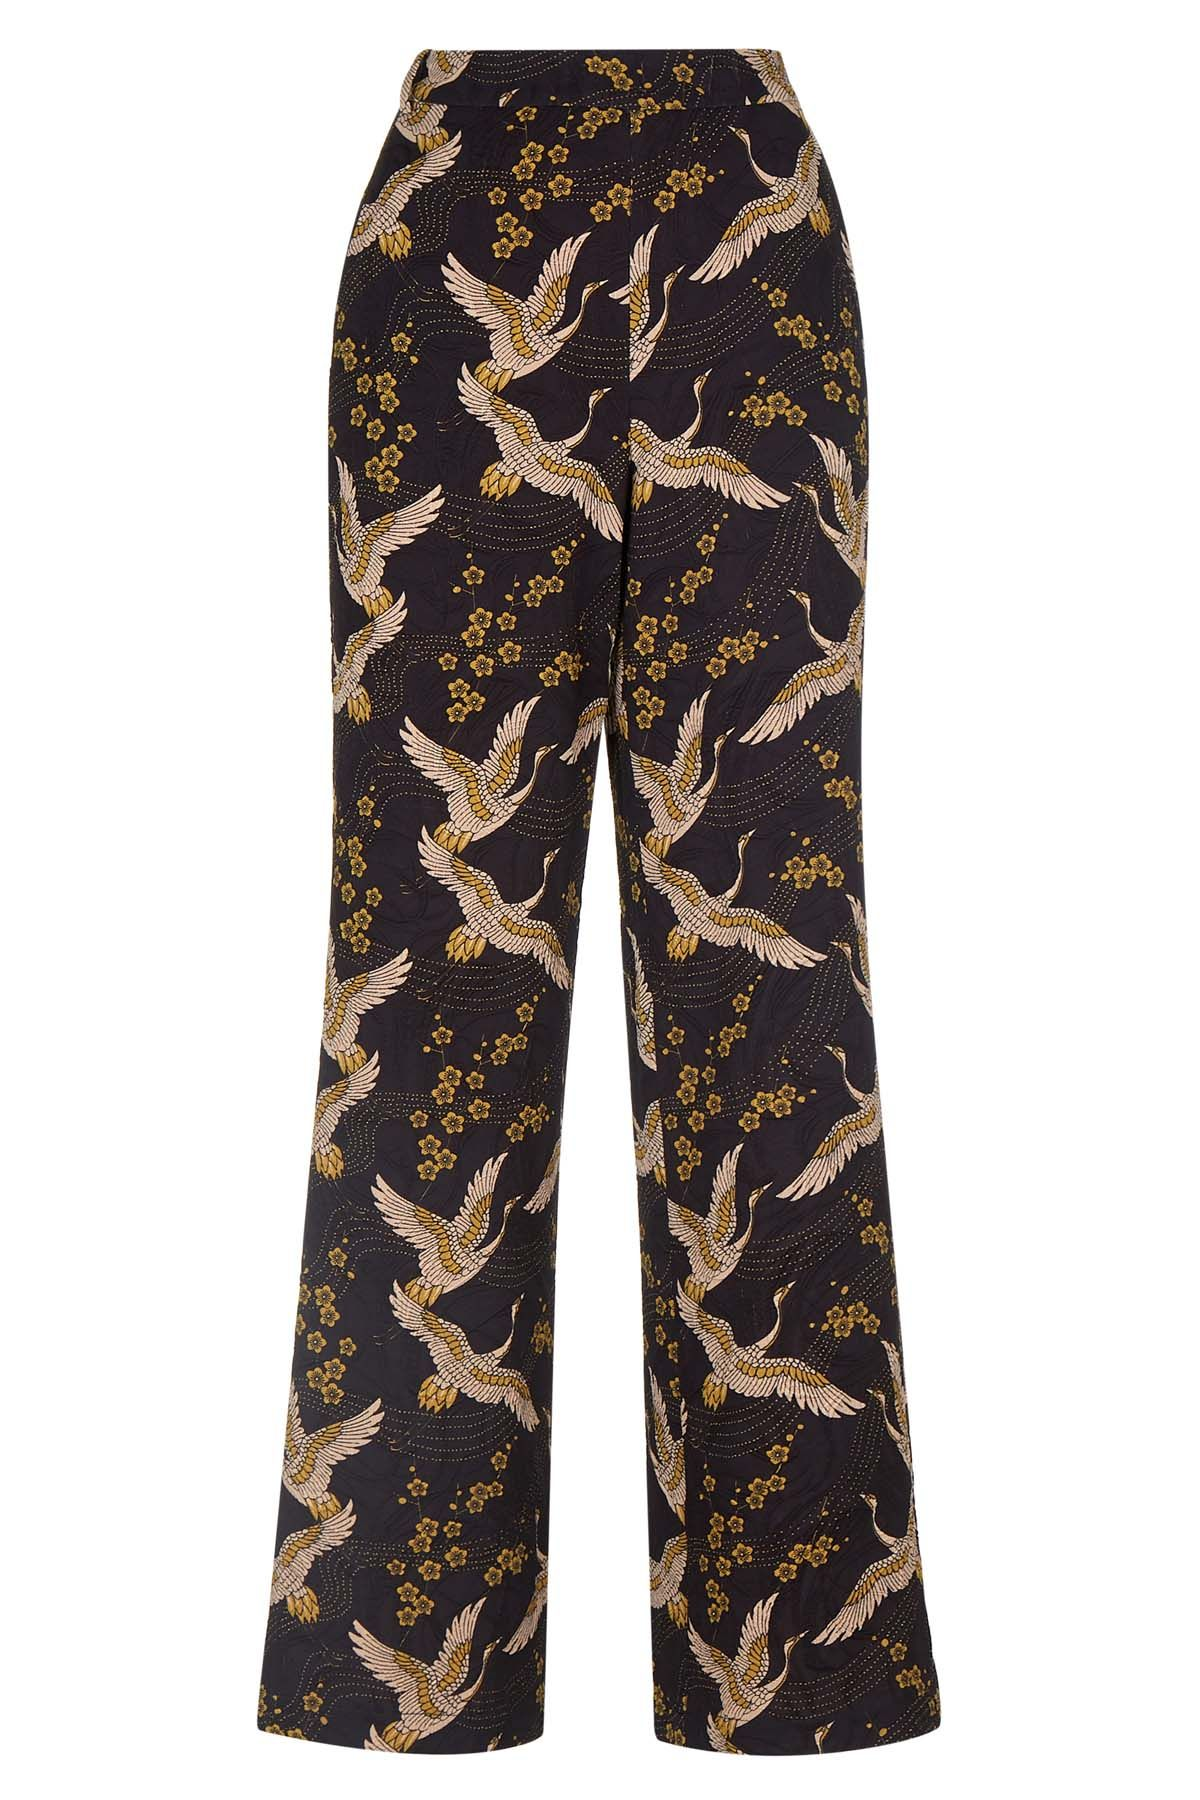 Bird Print Straight Leg Trousers in Black